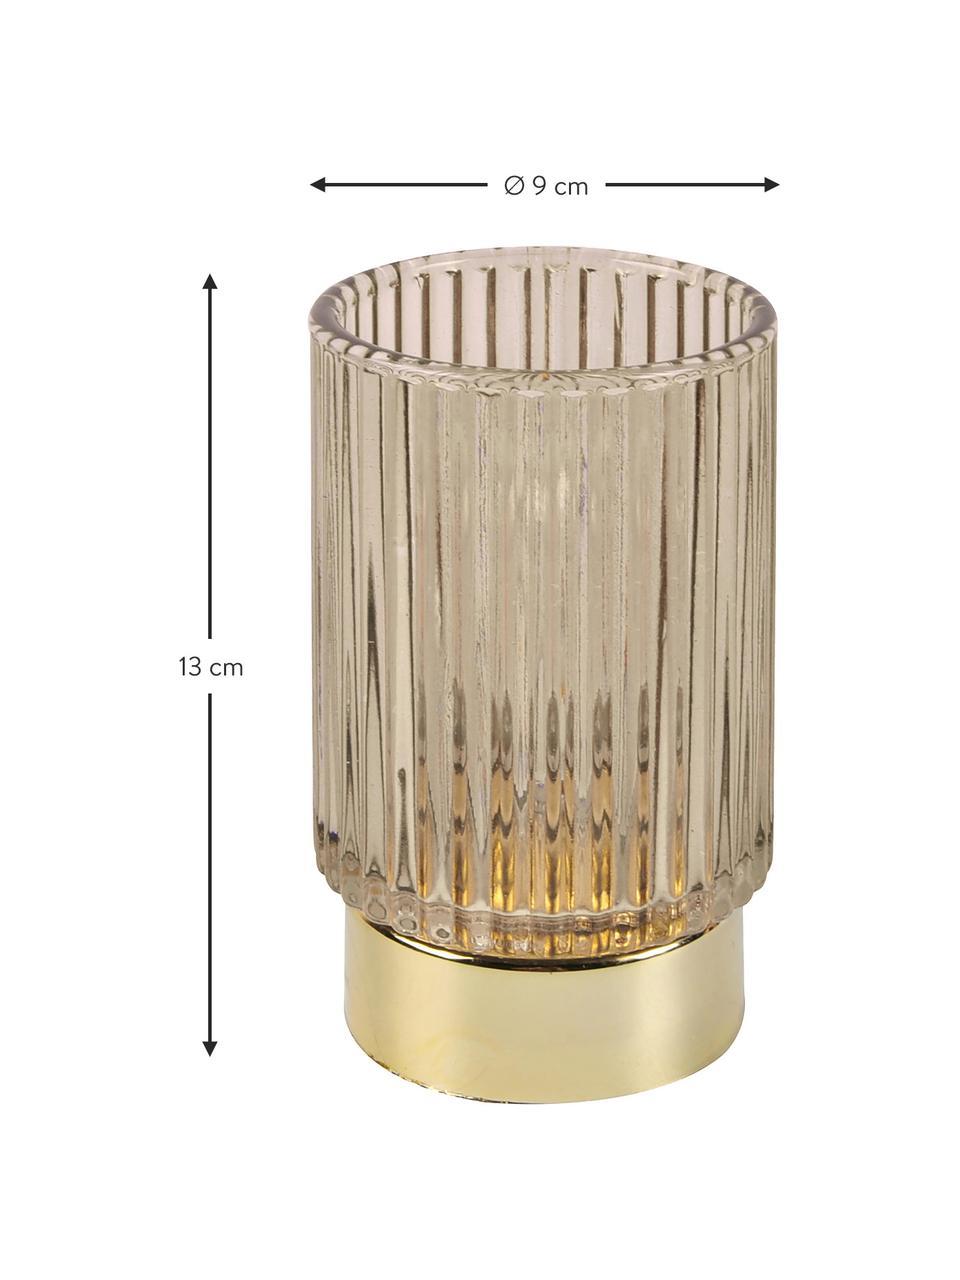 LED waxinelichthouder Ribbed, Glas, Beige, Ø 9 x H 13 cm